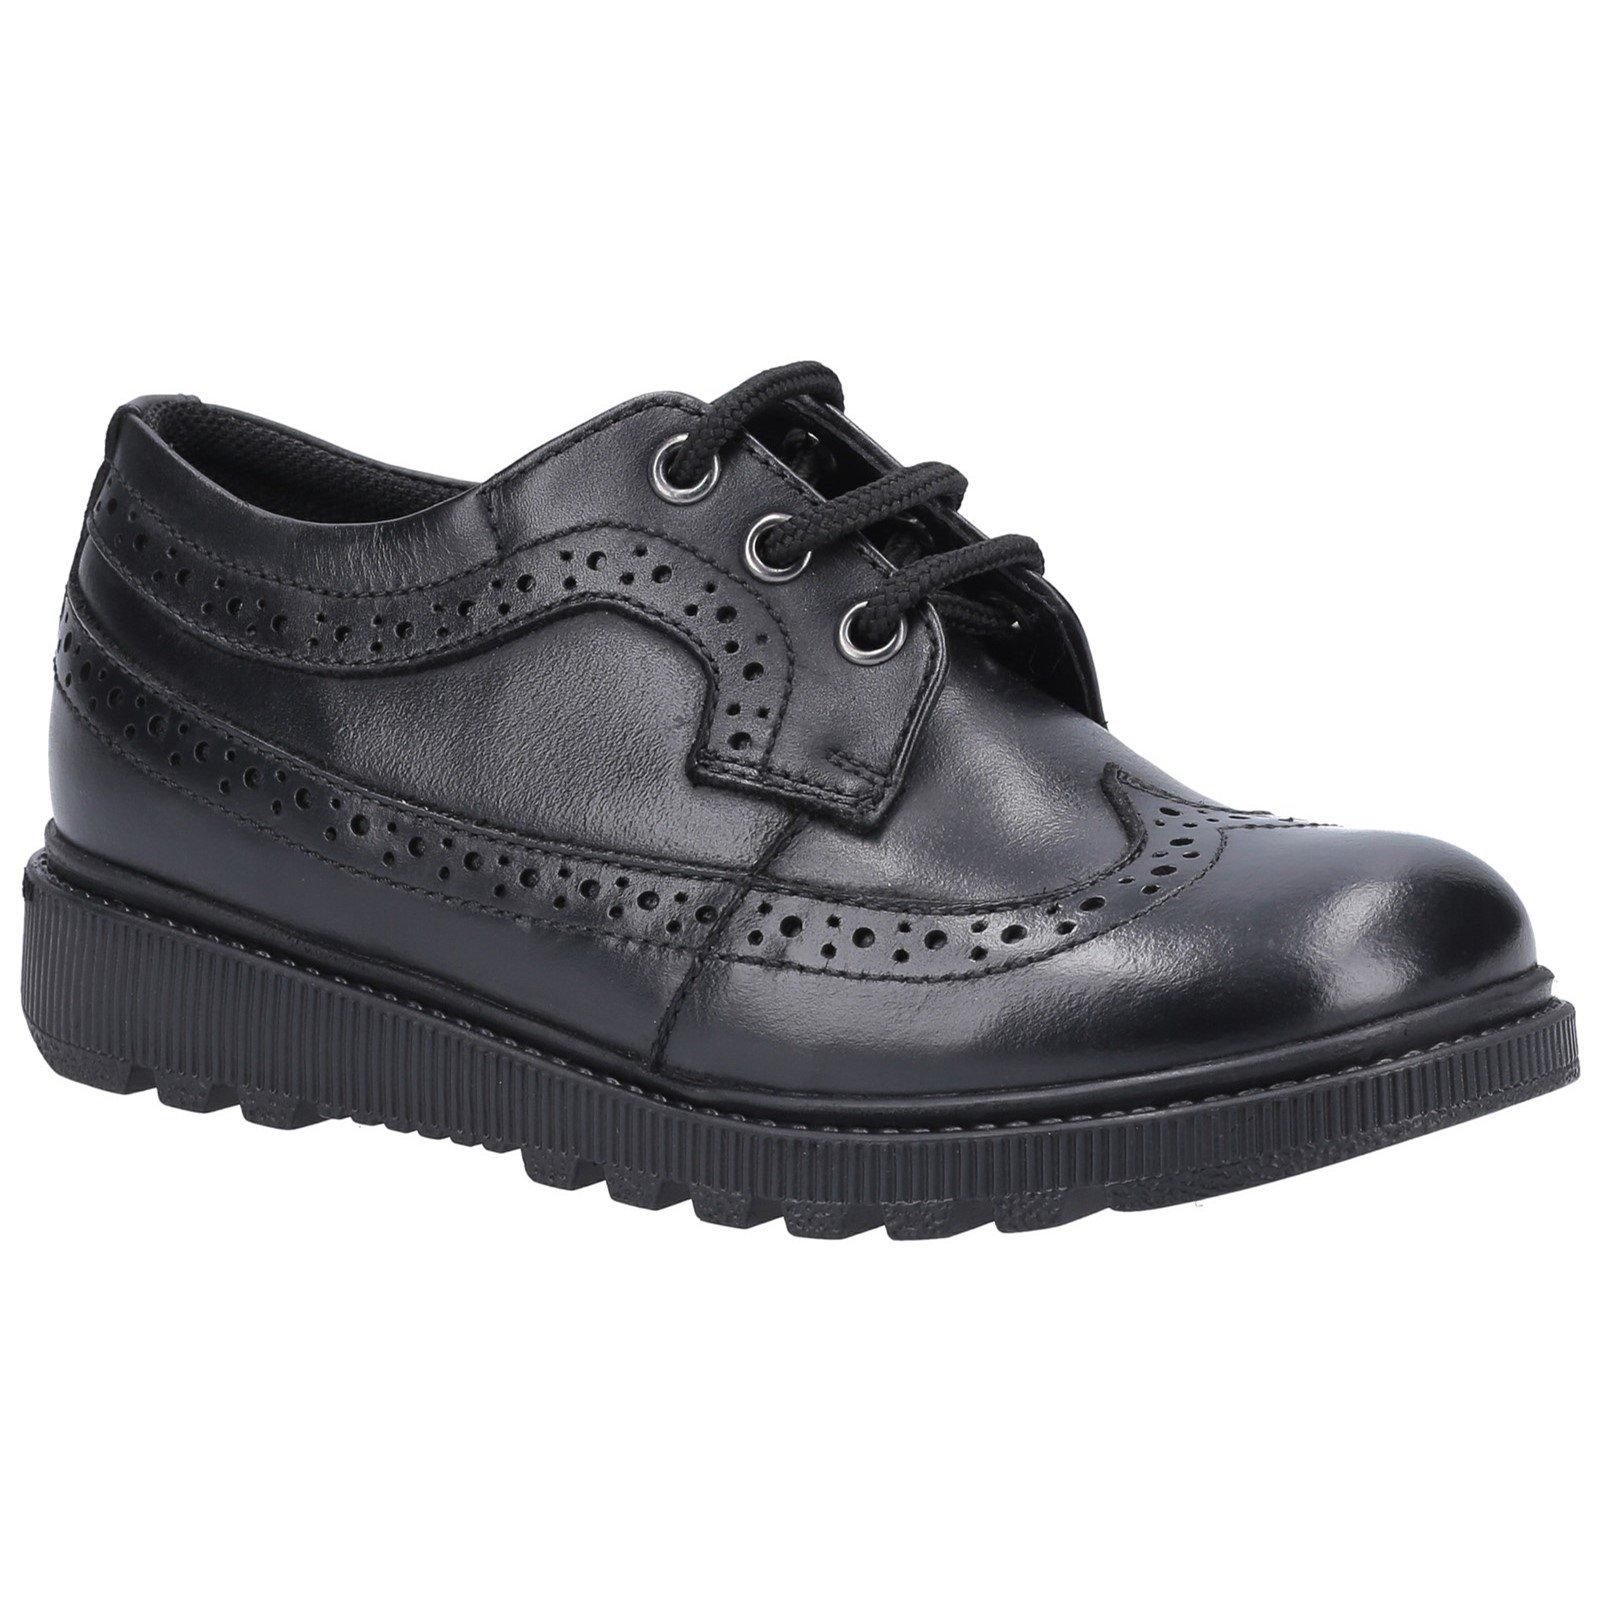 Hush Puppies Kid's Felicity Junior School Oxford Shoe Black 30849 - Black 1